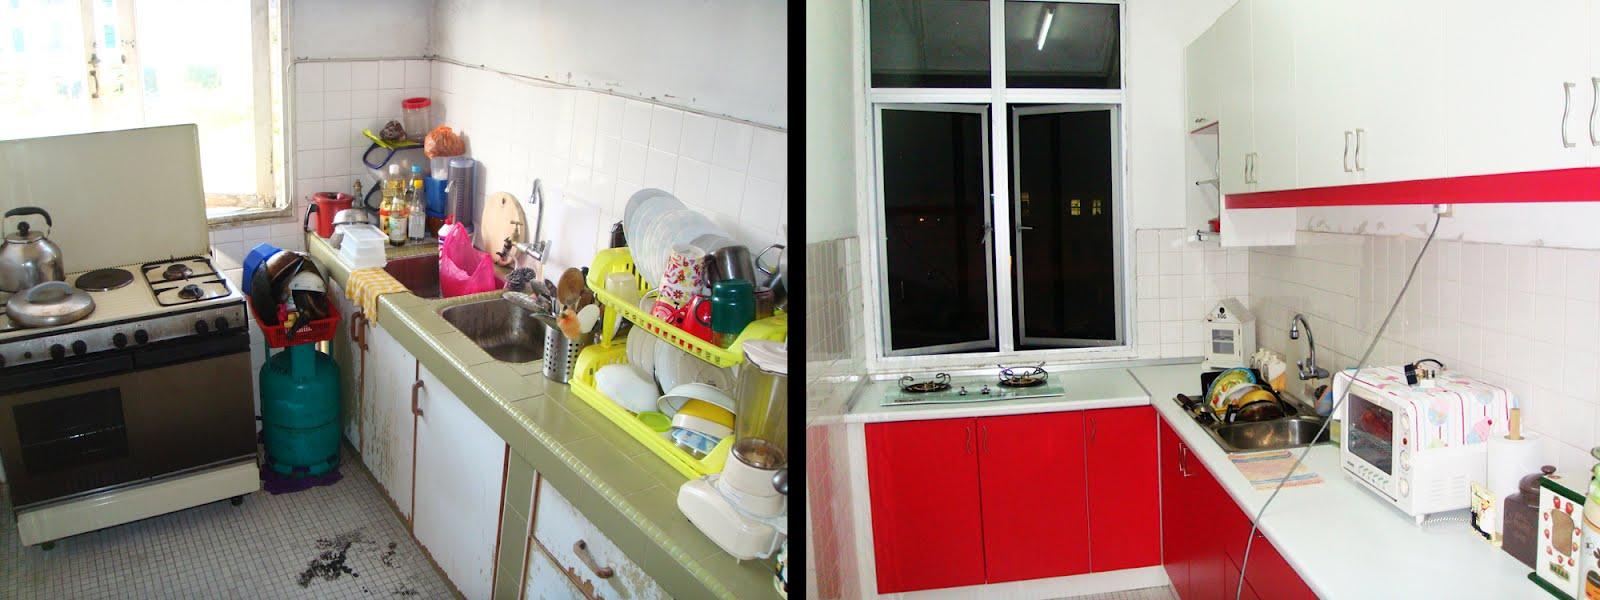 Kabinet Dapur Minimalis Termurah Zaldeco Jualbeli Online Clifieds Forum Cari Infonet